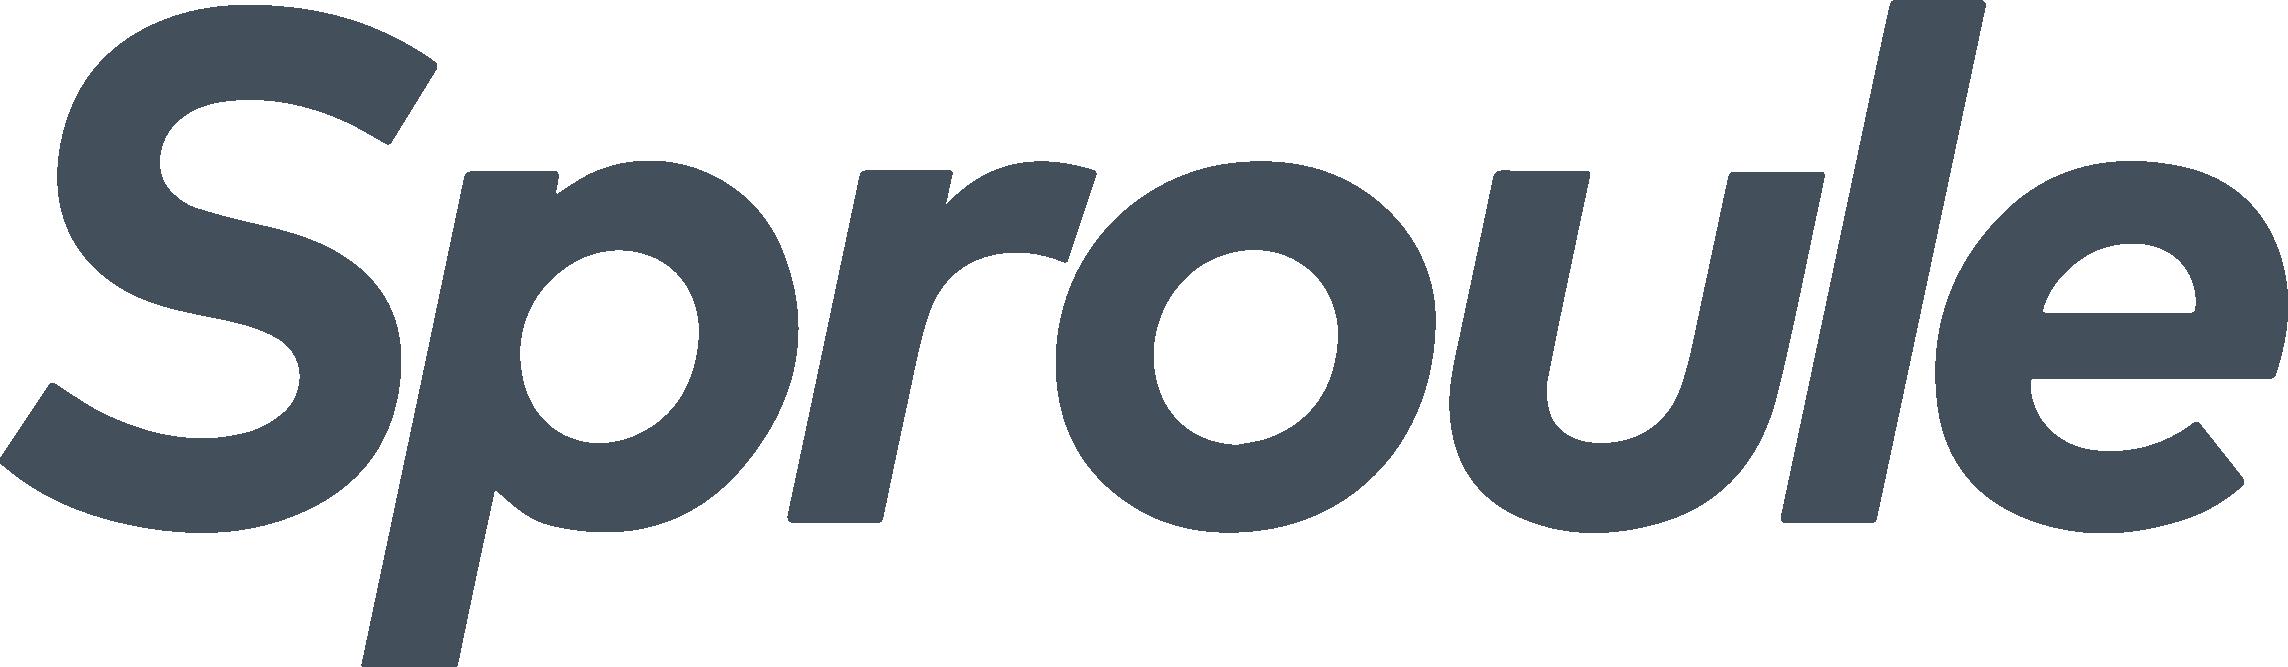 sproule-wordmark_Primary